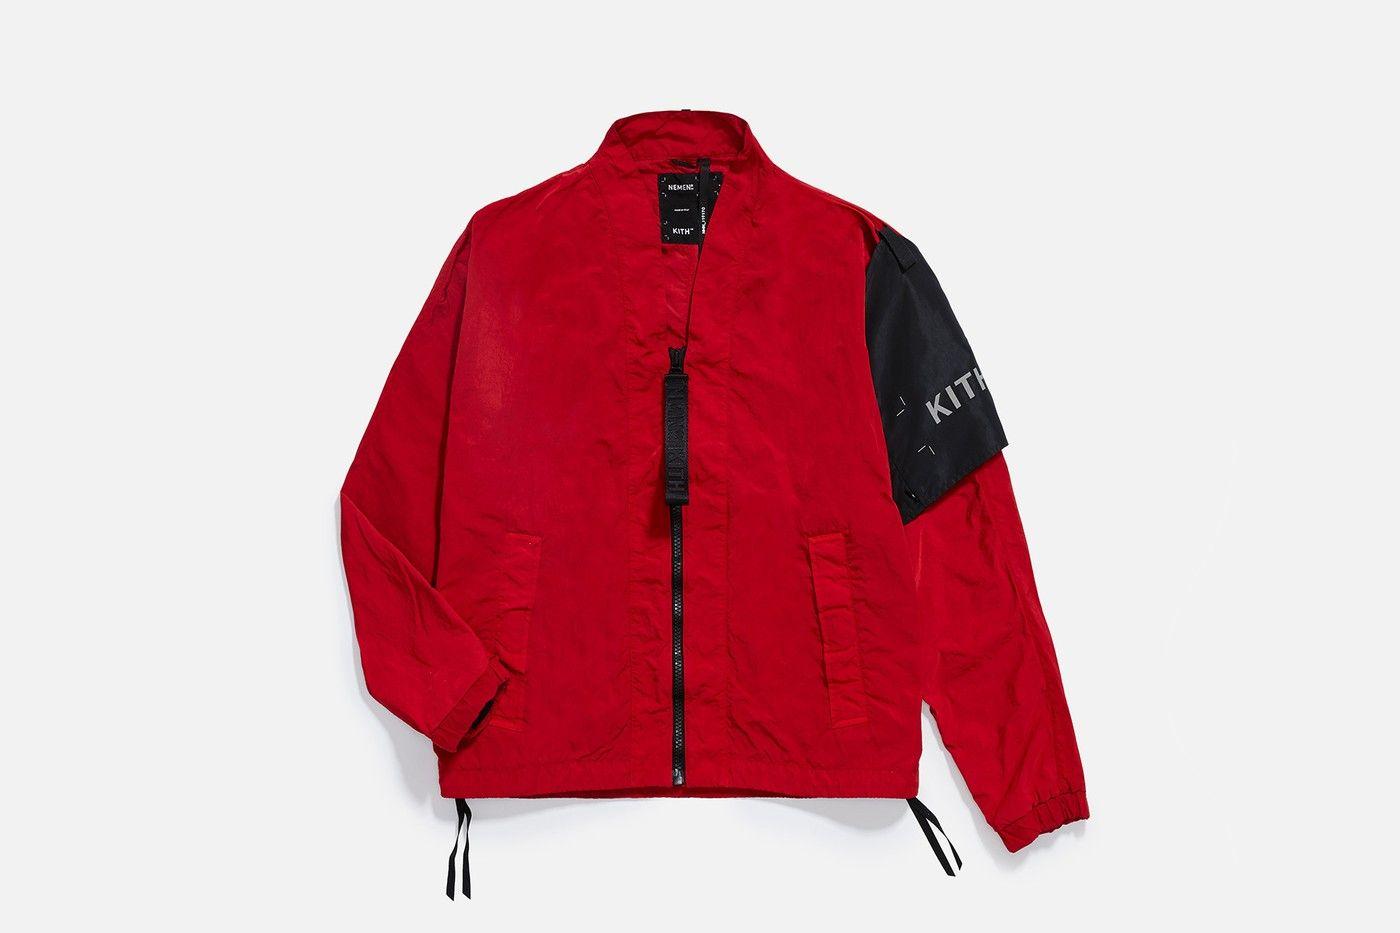 Kith Nemen S Tie Dye Capsule Athletic Jacket Puma Jacket Menswear [ 933 x 1400 Pixel ]